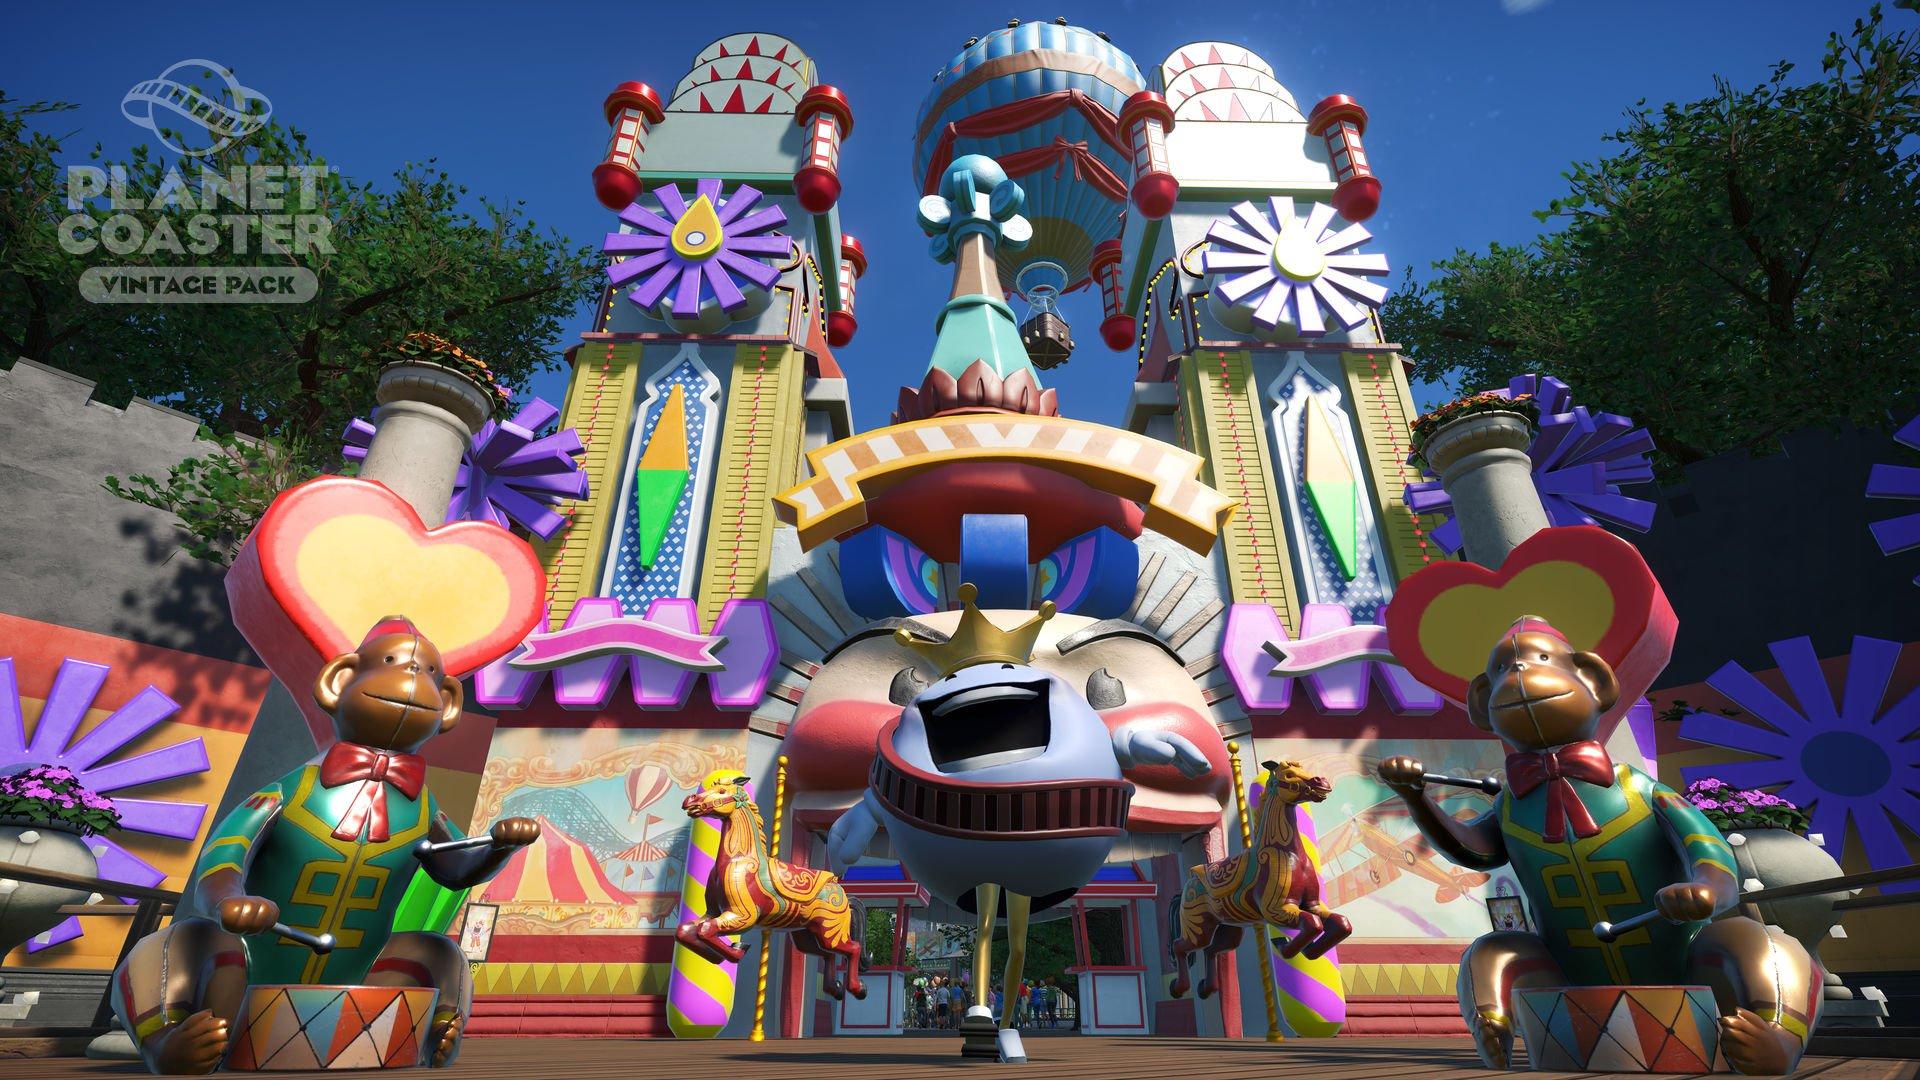 Planet Coaster |OT| A New Era of Theme Park Games | ResetEra